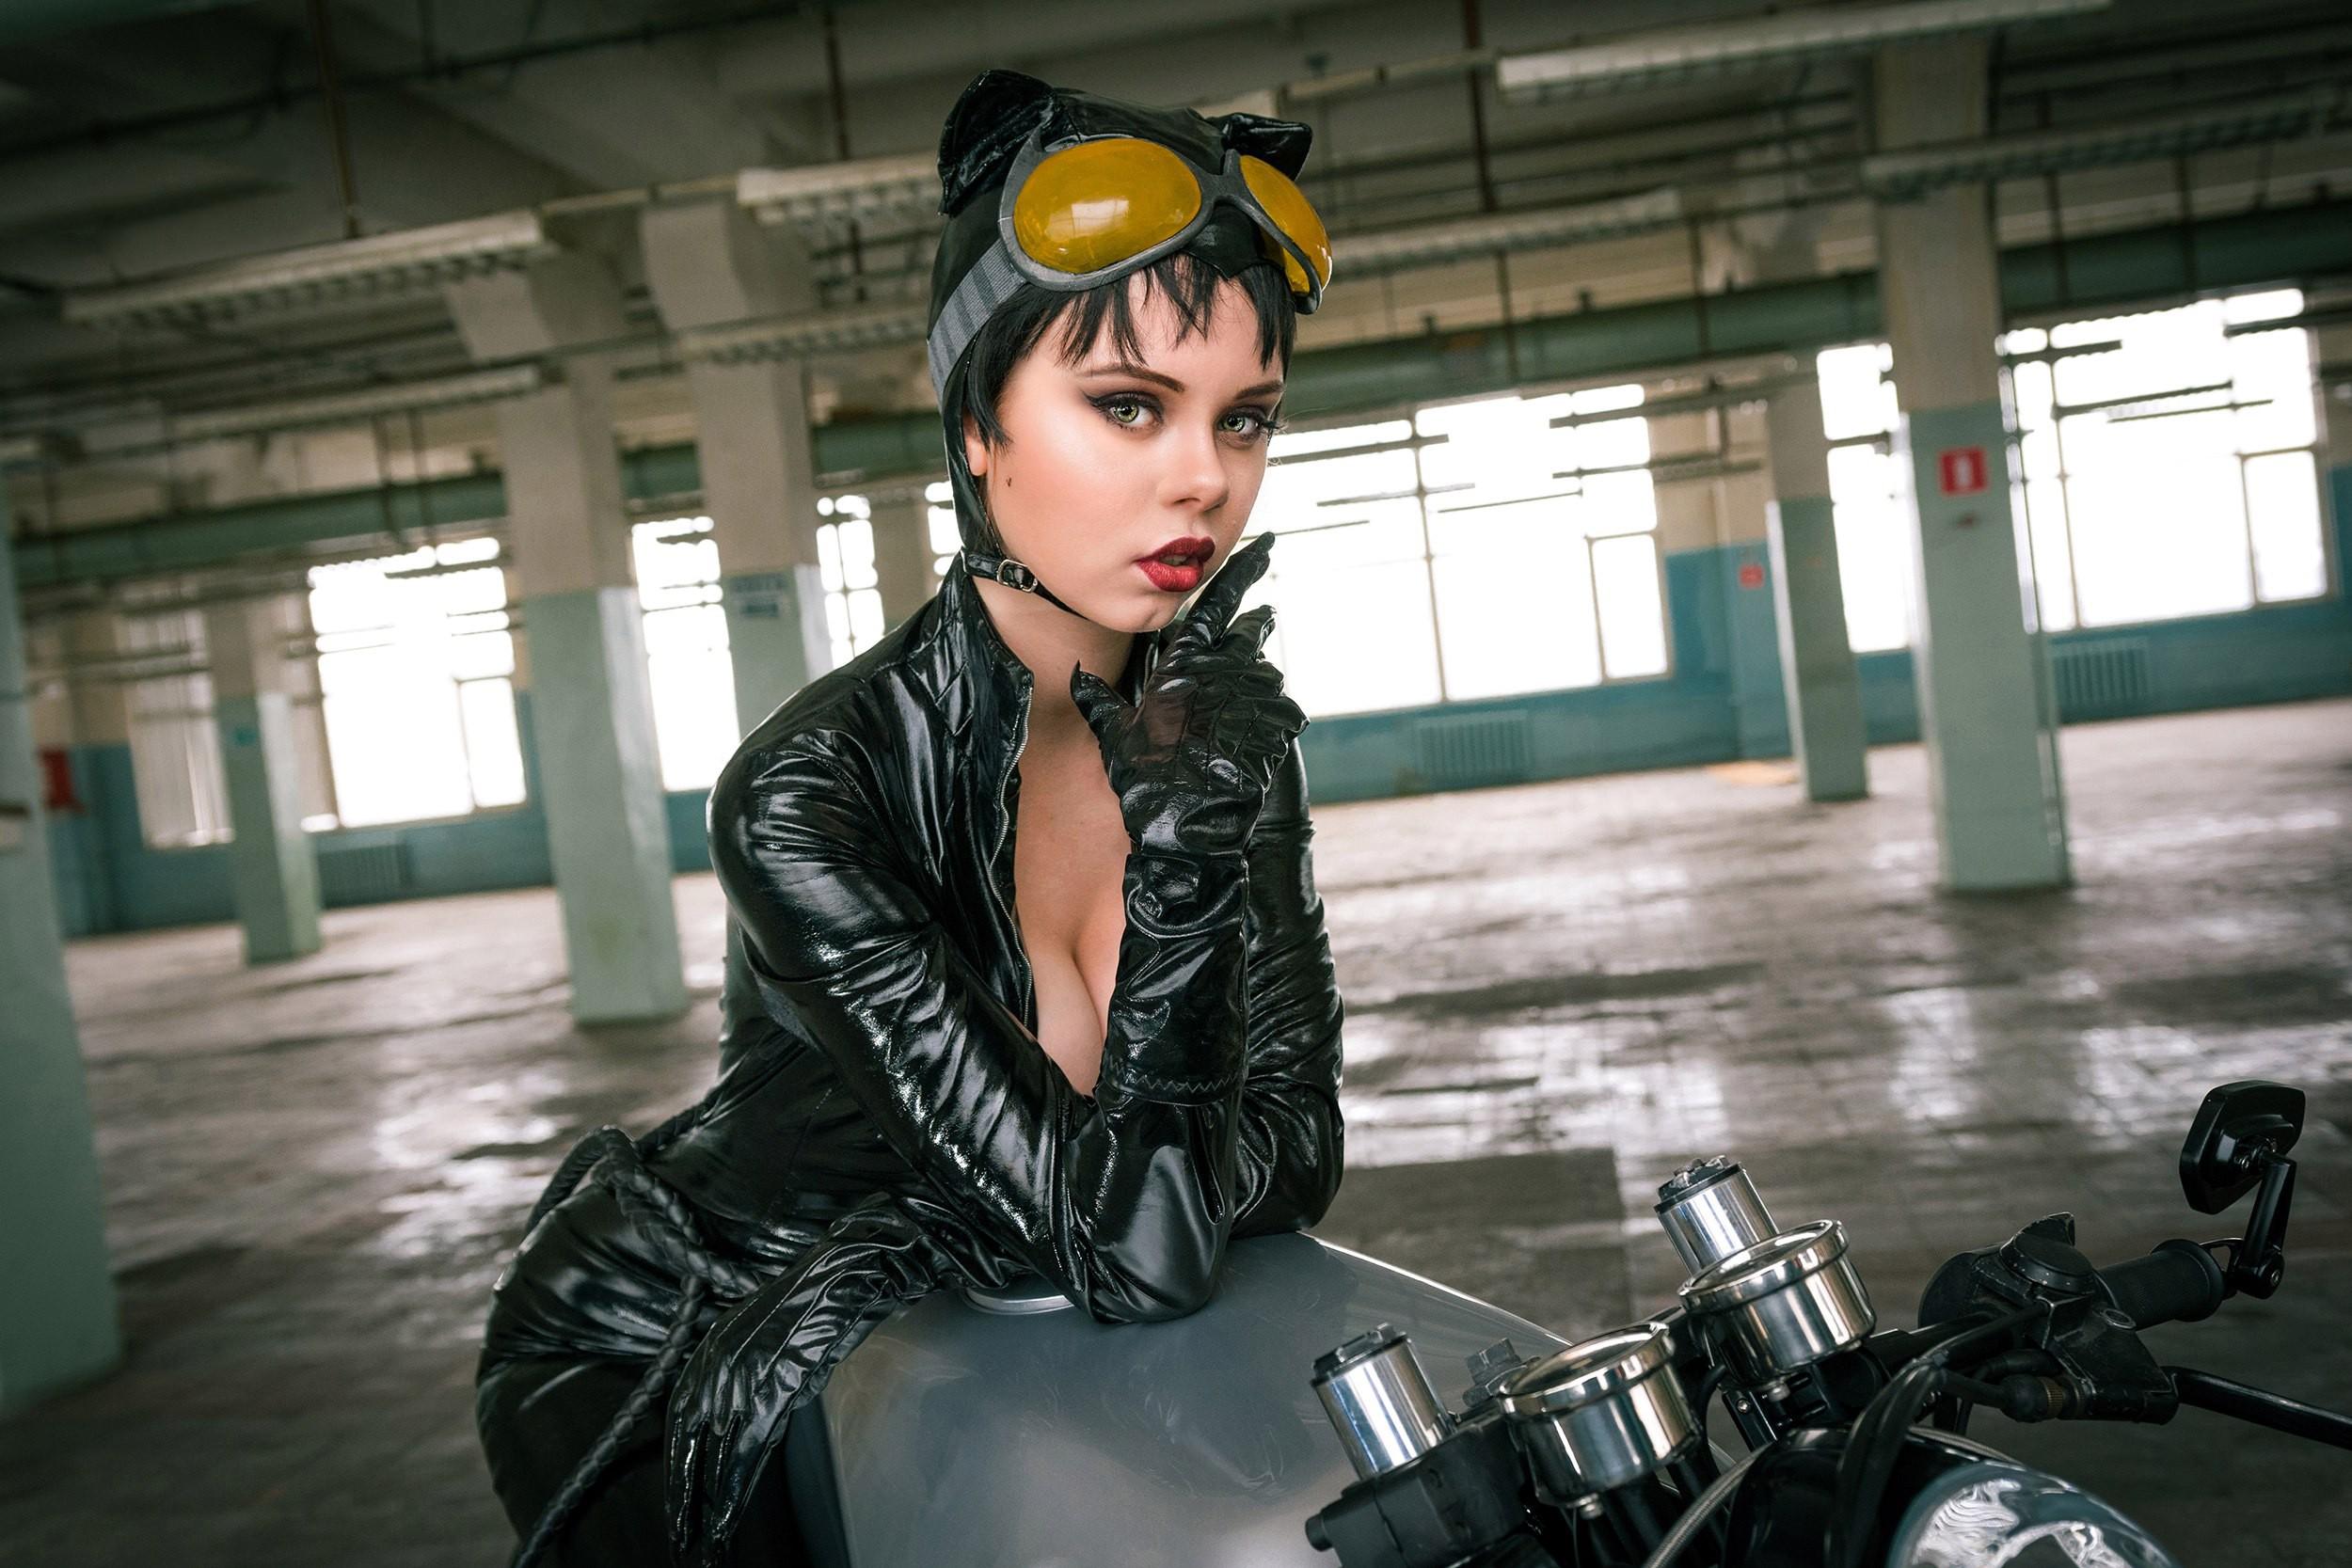 Wallpaper  Women, Cosplay, Model, Portrait, Motorcycle -4095